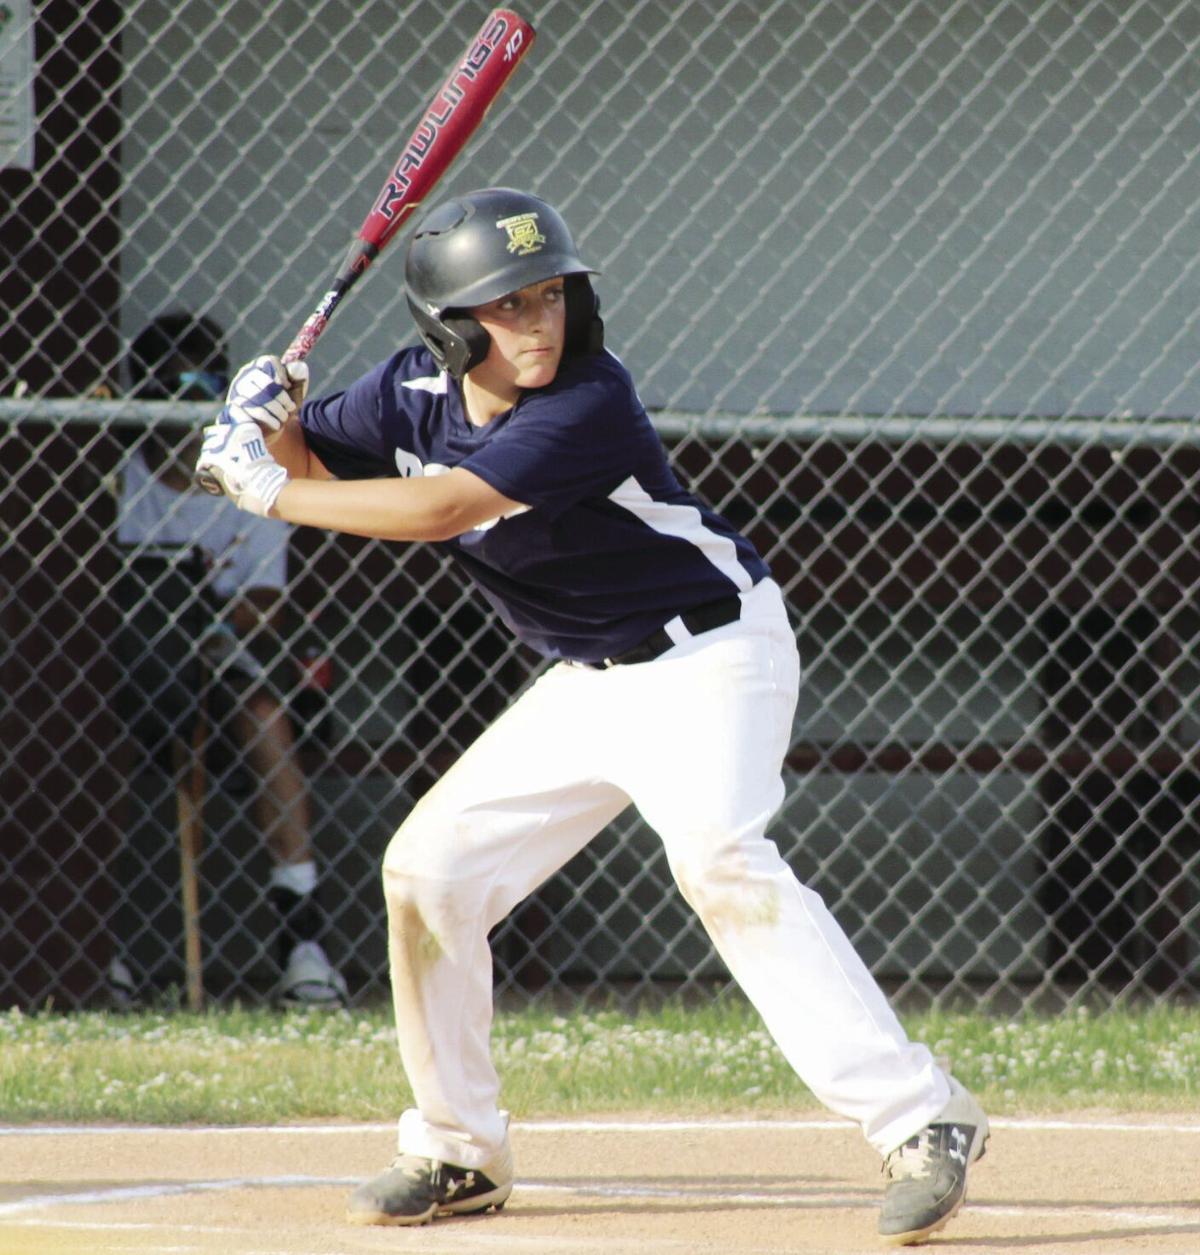 DeGrenier gets ready to swing